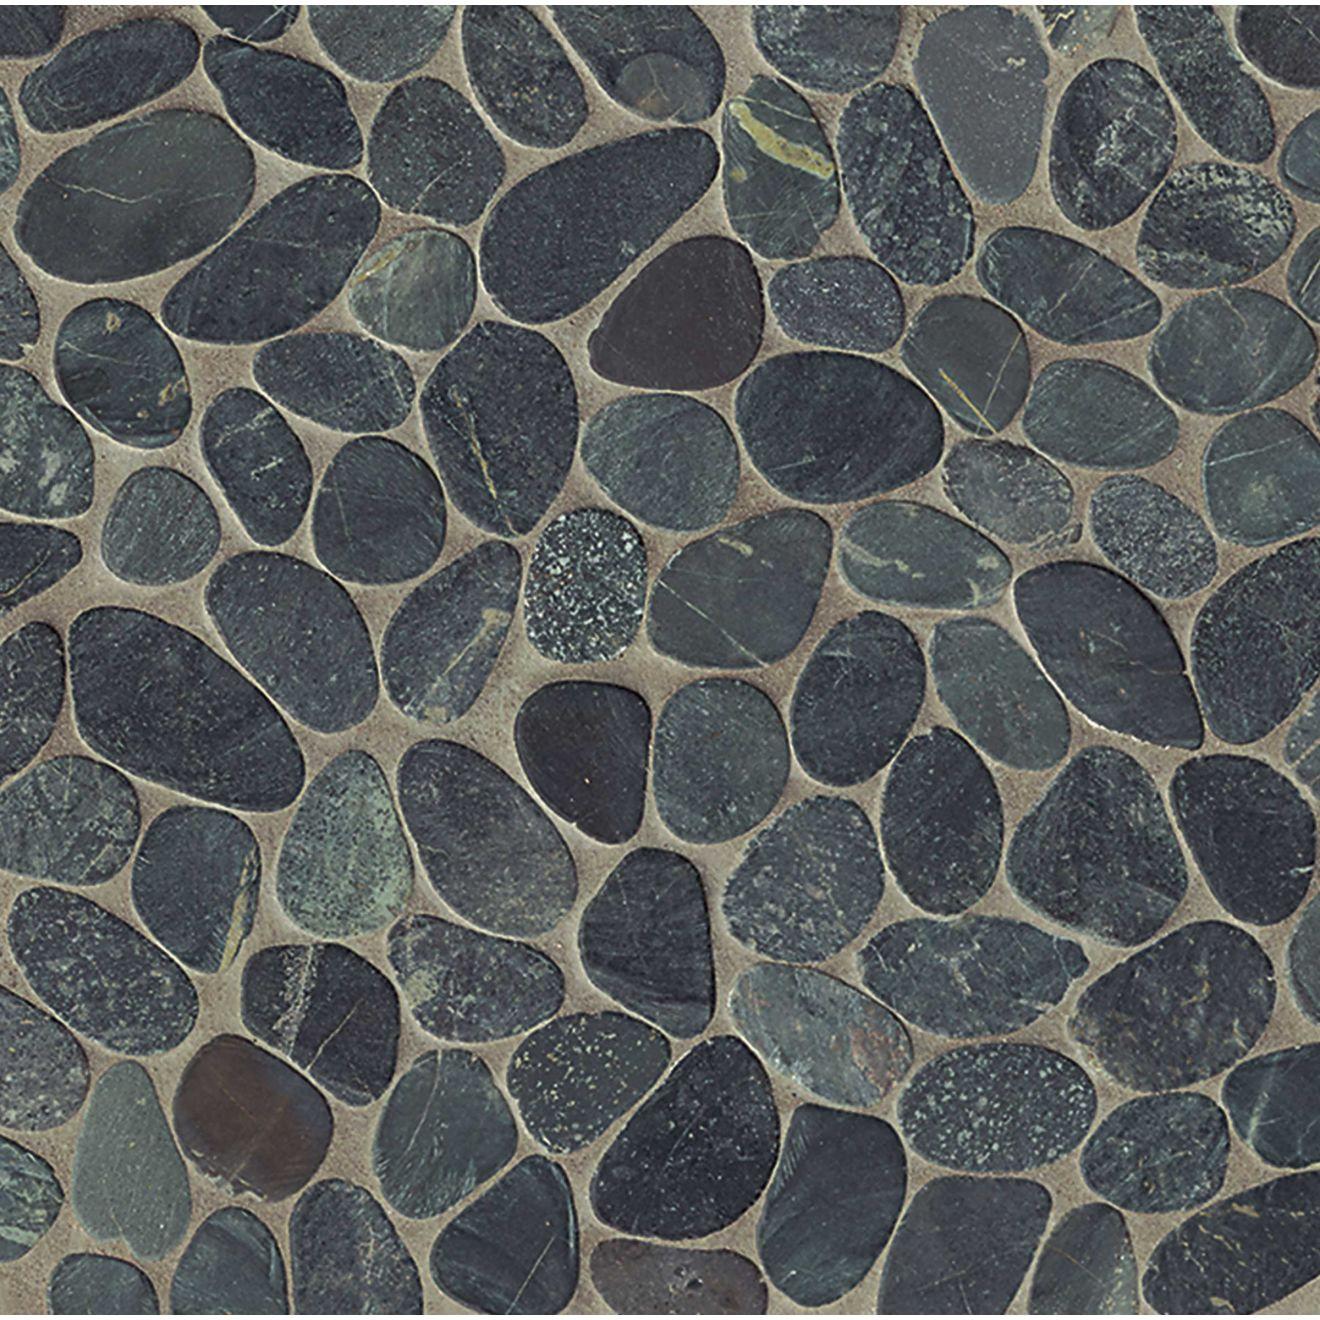 Hemisphere Unglazed Sliced Pebble Mosaic in Ocean Black